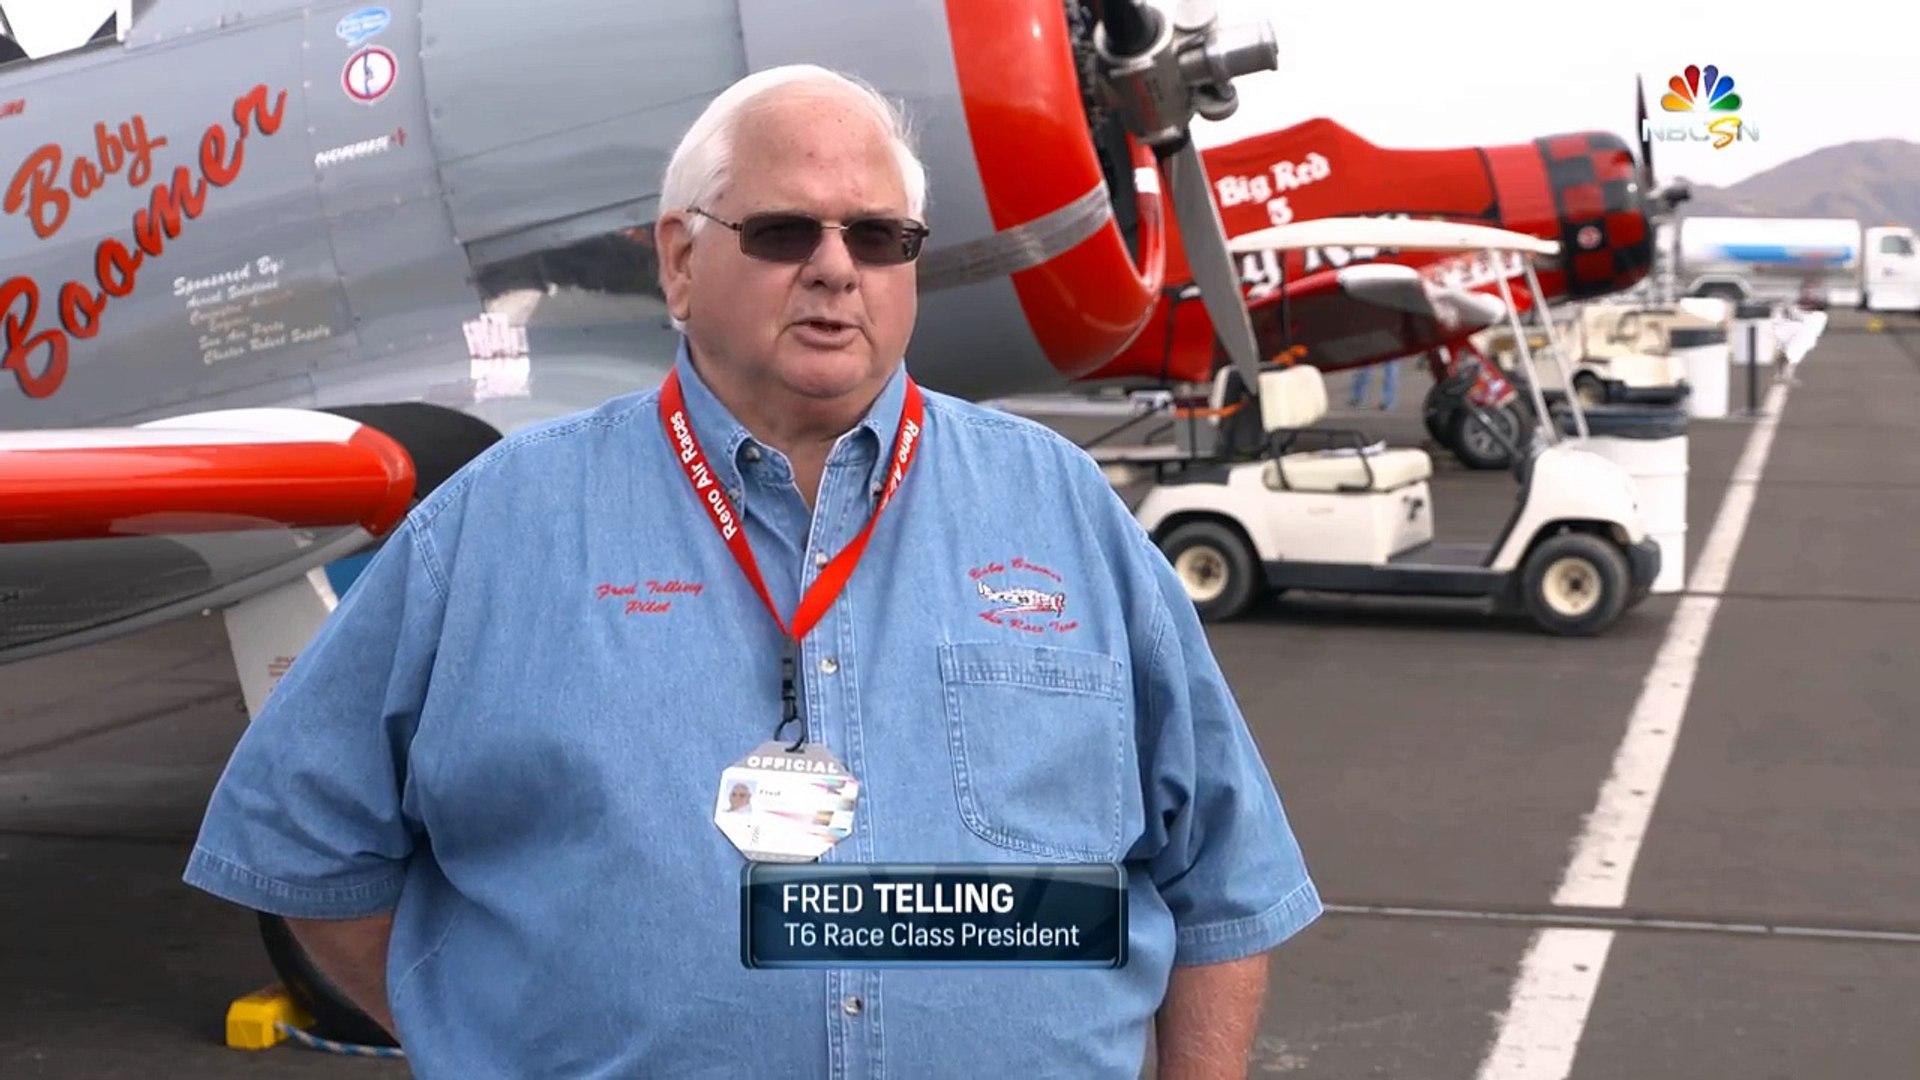 2016 STIHL National Championship Air Races Reno Nevada - #2 of 3